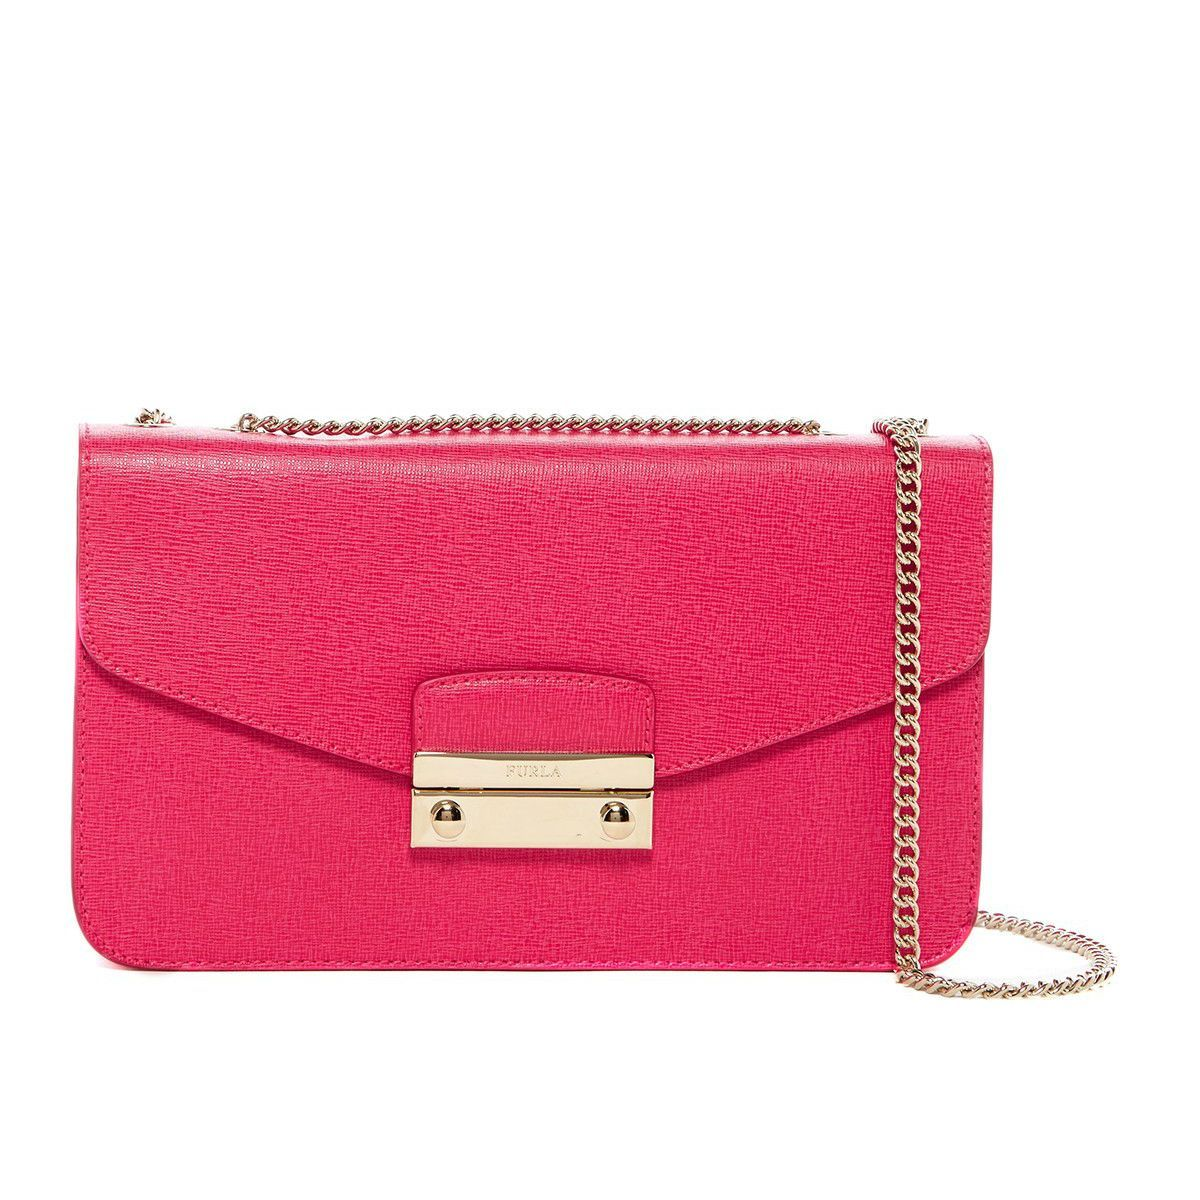 Womens Pouch On Sale, Pink Quartz, Leather, 2017, one size Furla